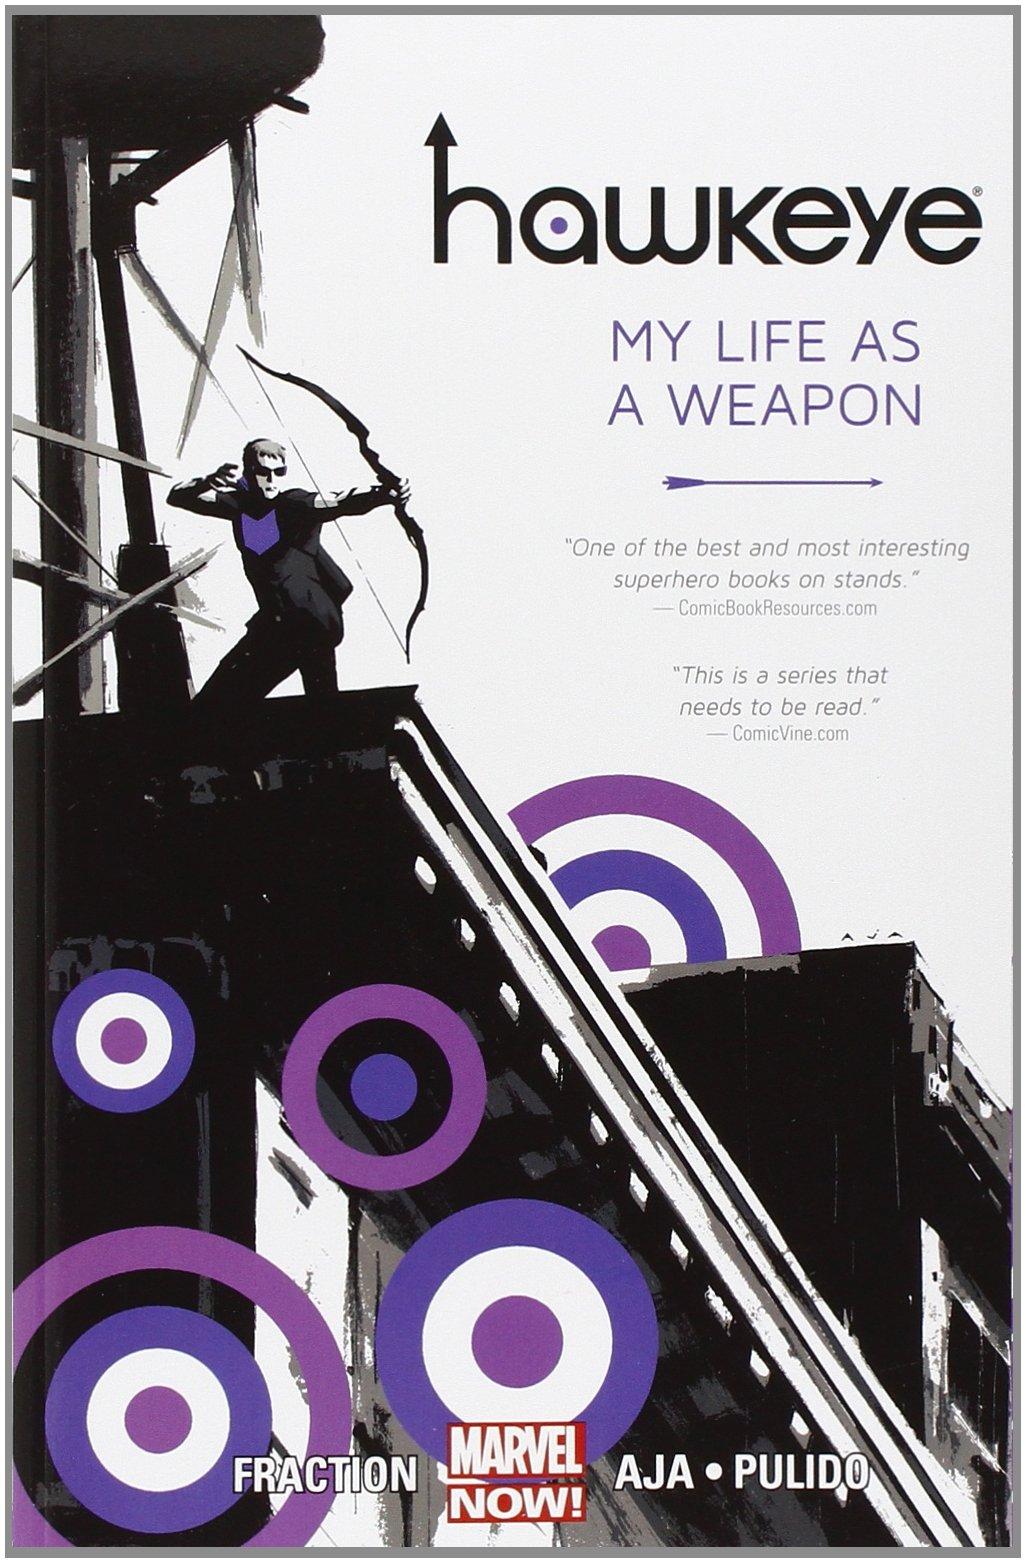 Hawkeye: My Life as a Weapon